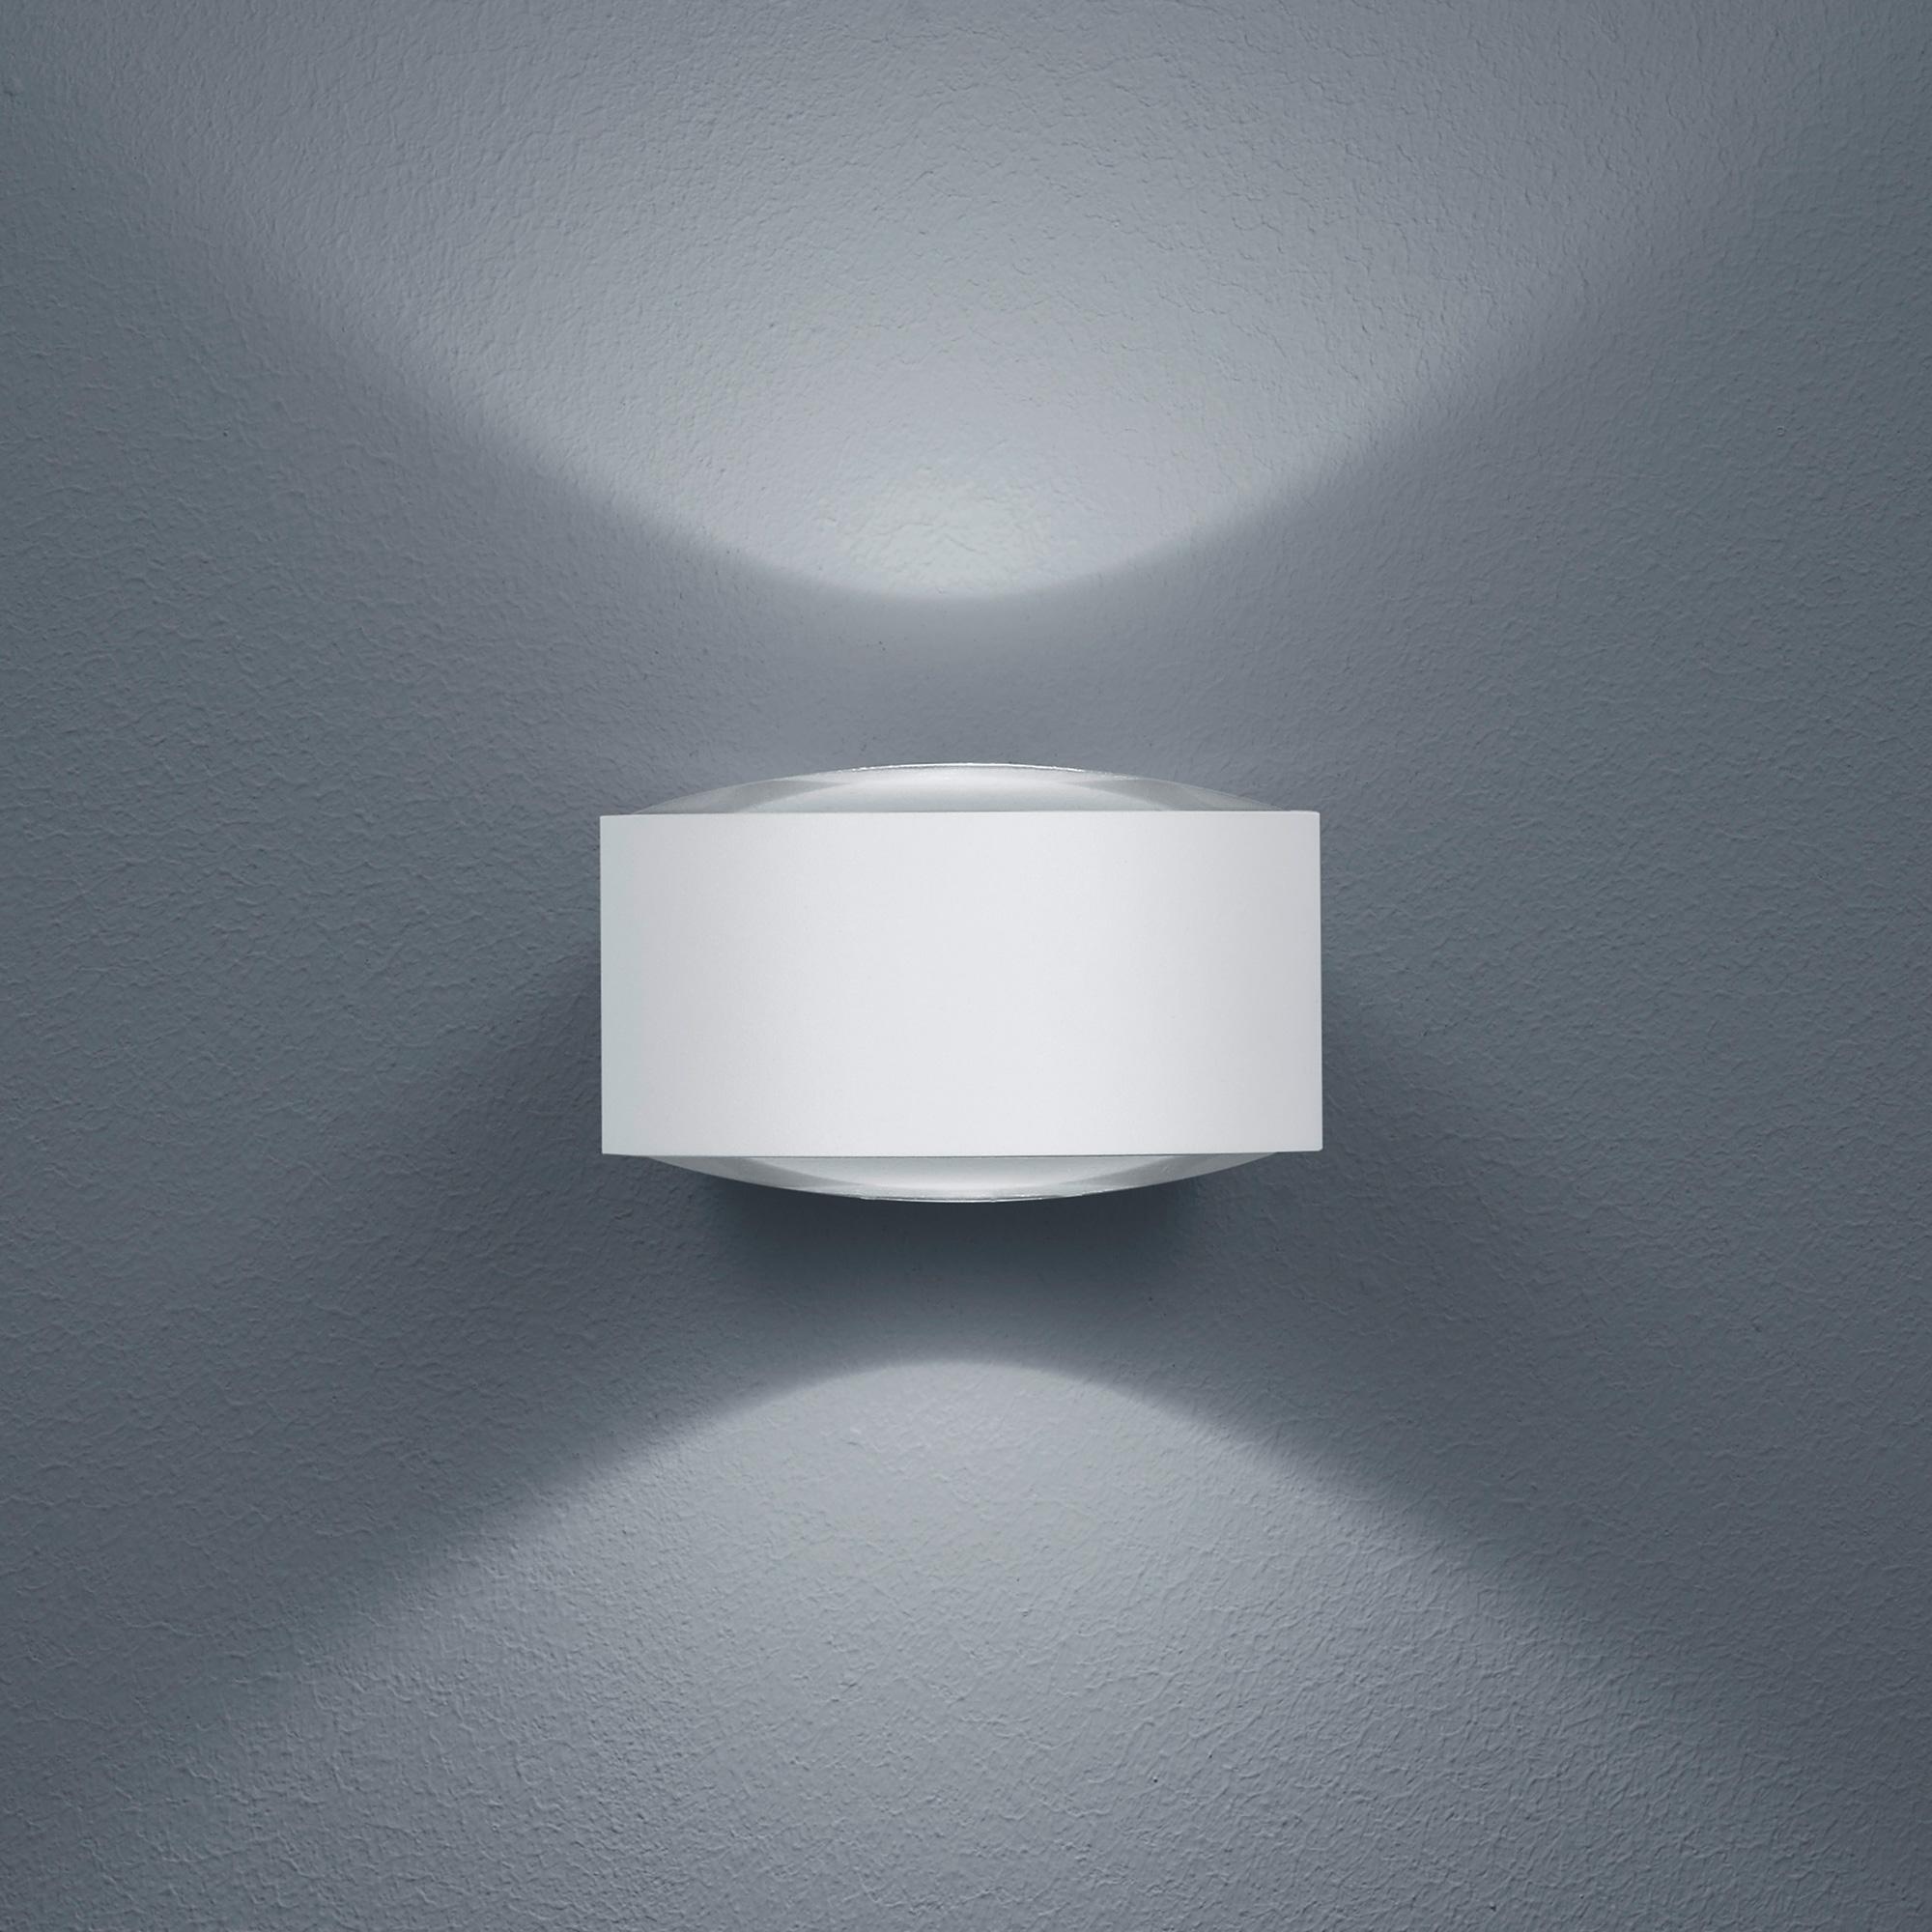 led wandleuchte au enbereich flow wei up downlight helestra. Black Bedroom Furniture Sets. Home Design Ideas